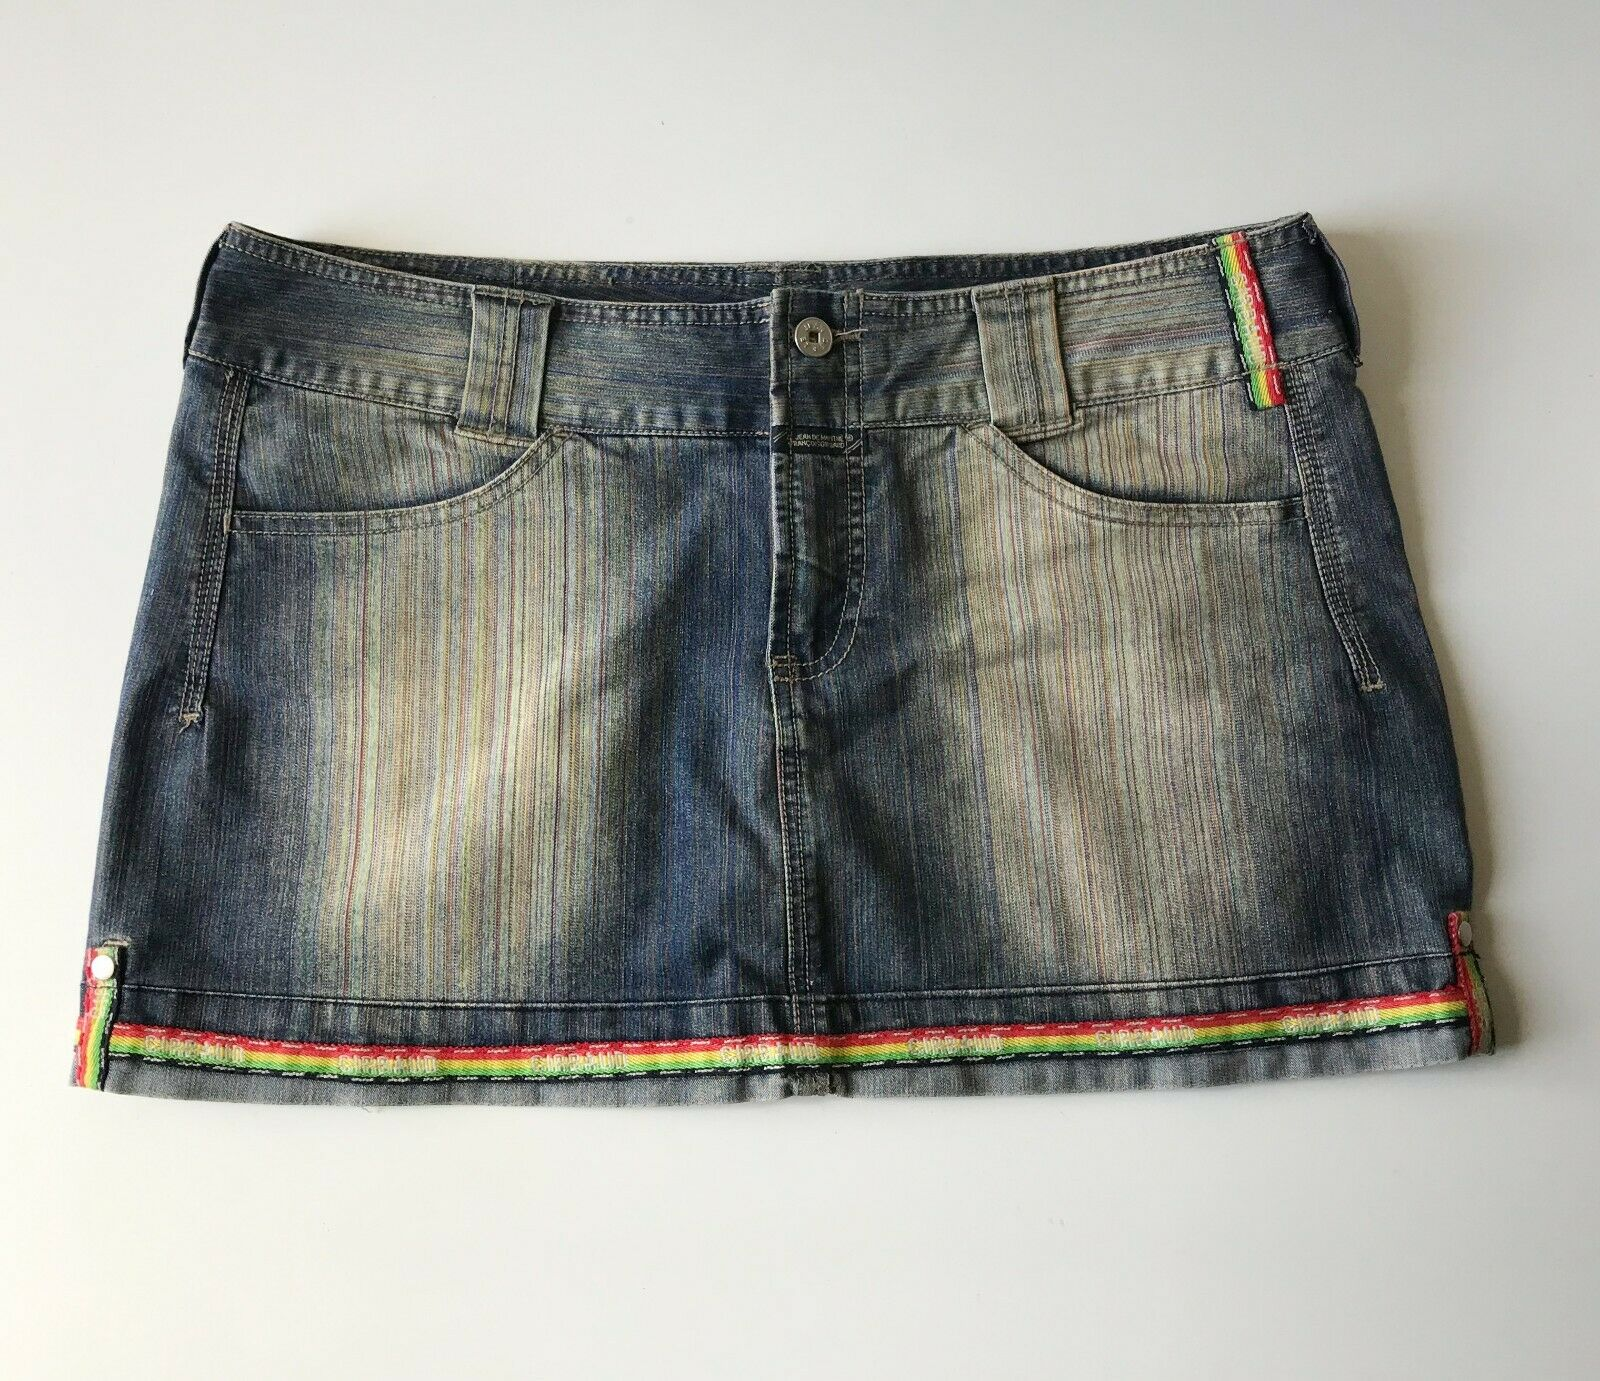 Jupe denim MARITHE FRANCOIS GIRBAUD jeans neon tendance 42-44